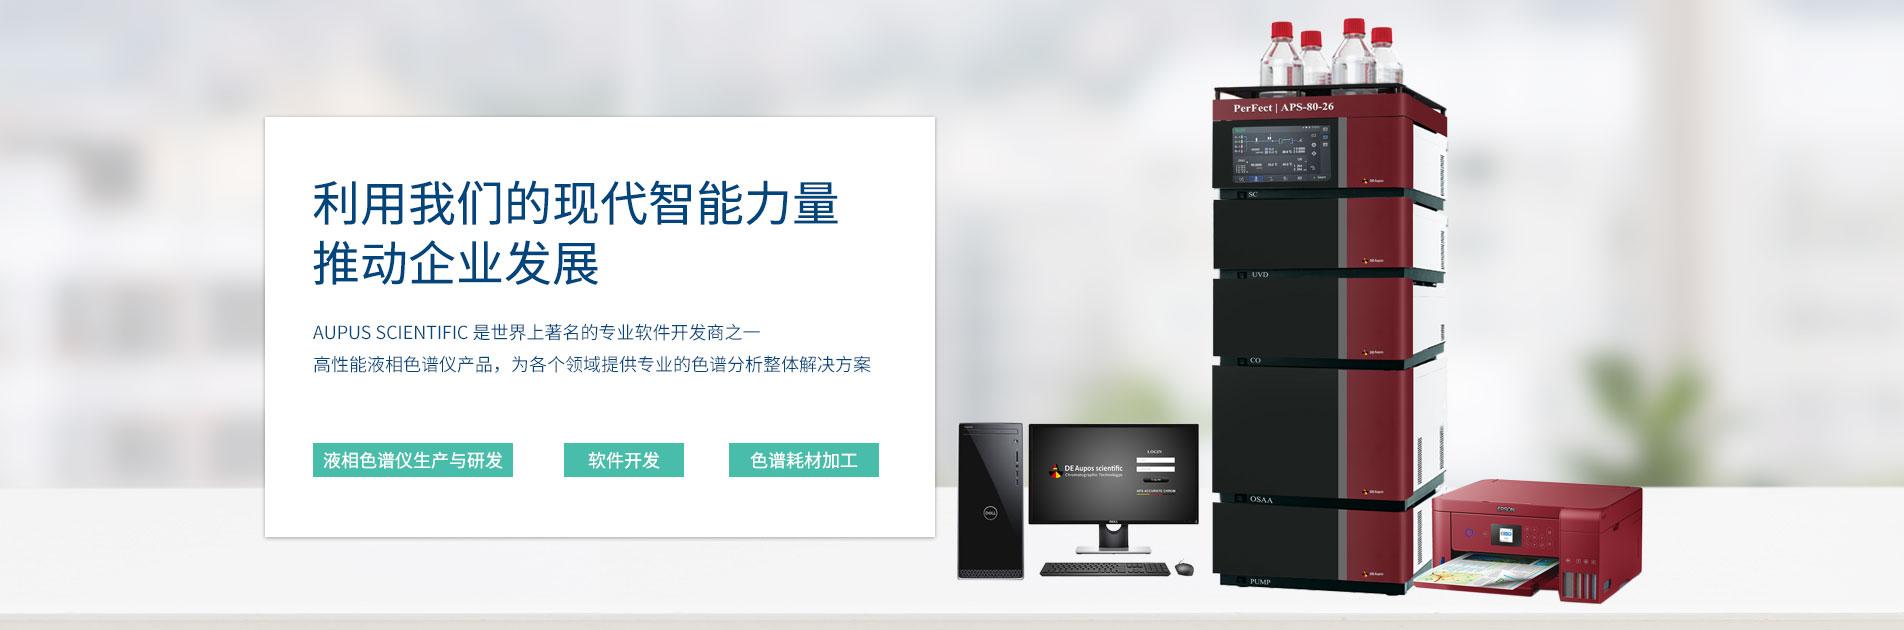 Luxury-APS-8036 自动液相色谱仪